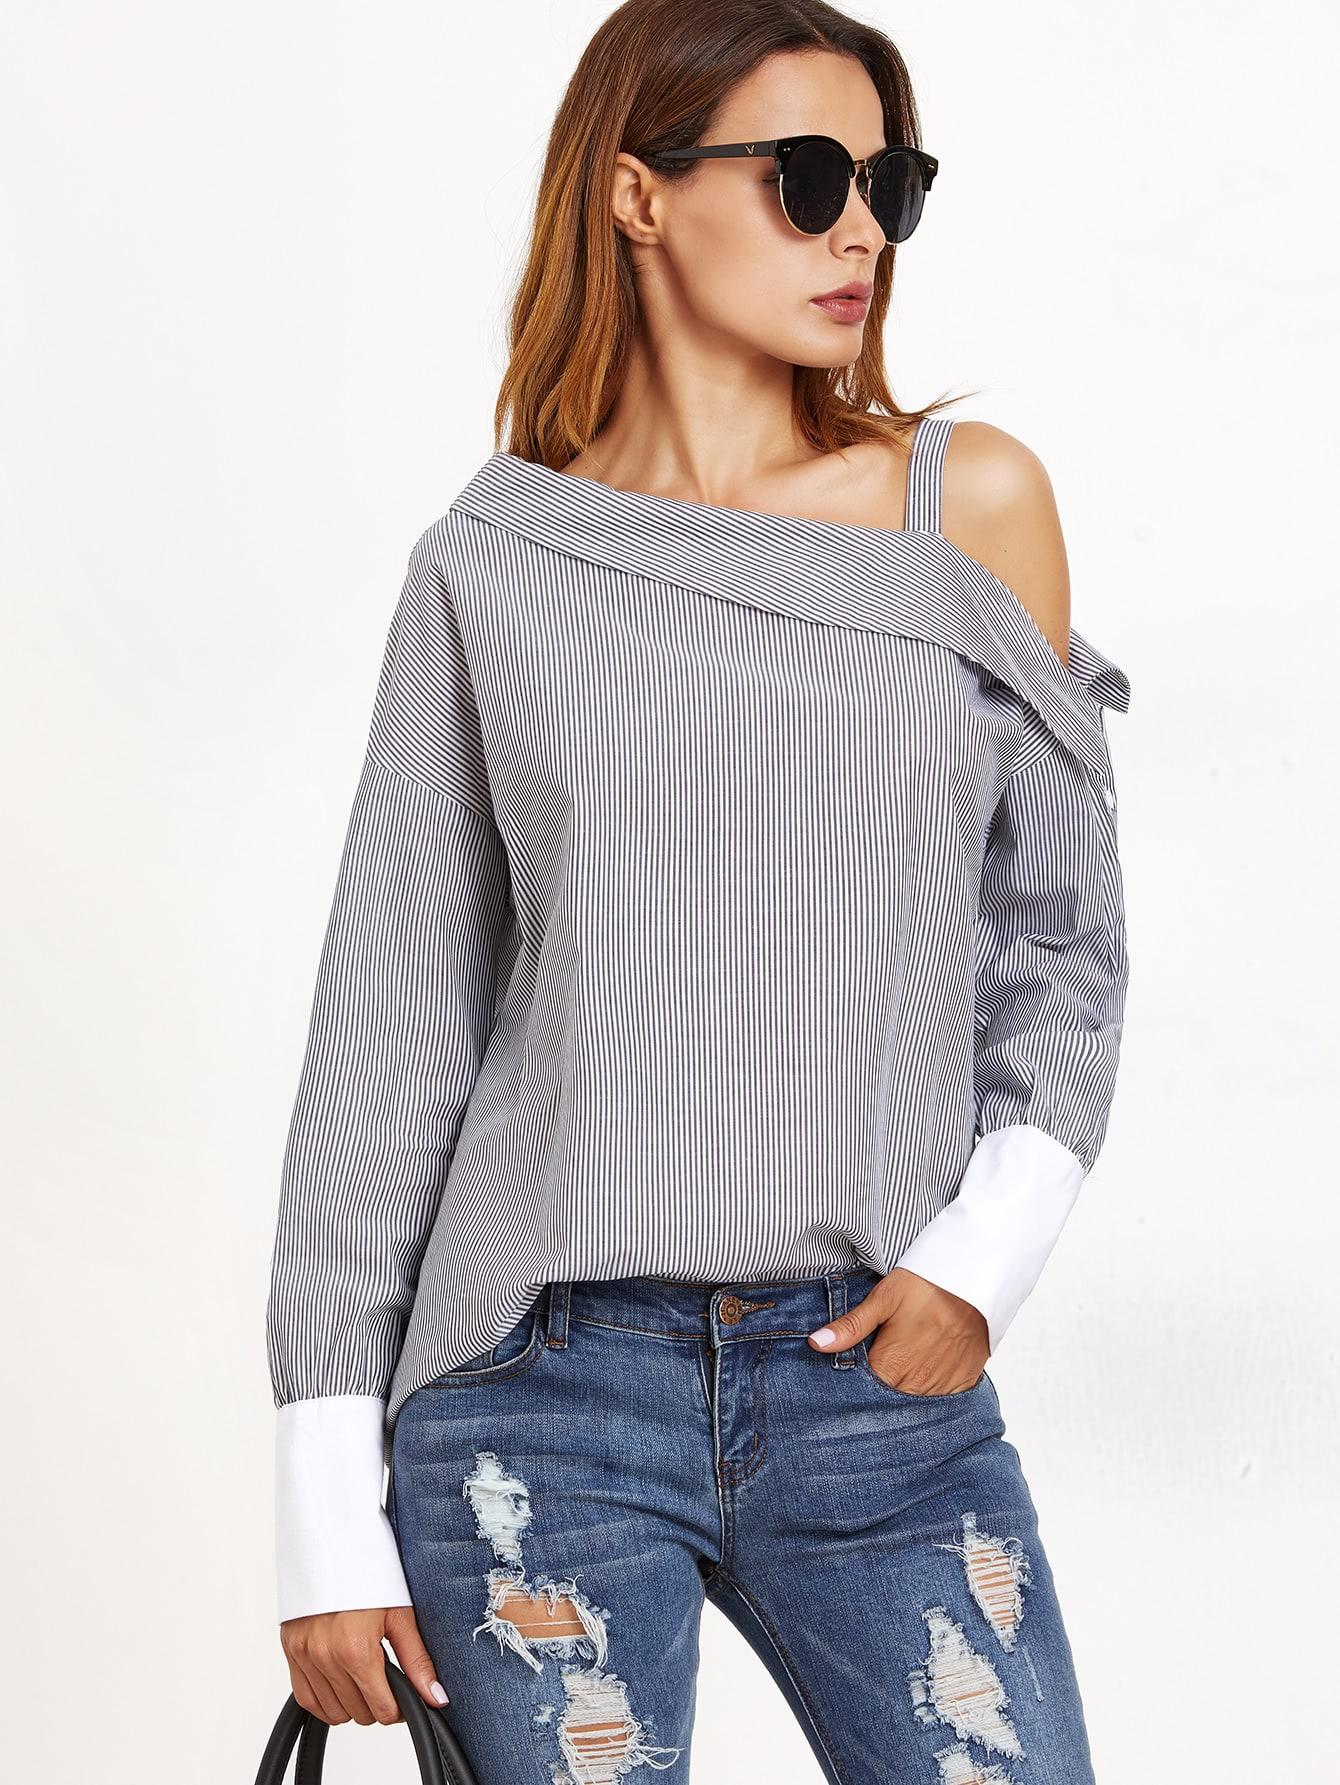 Asymmetric Open Shoulder Striped Contrast Cuff Blouse striped asymmetric buttoned neck blouse